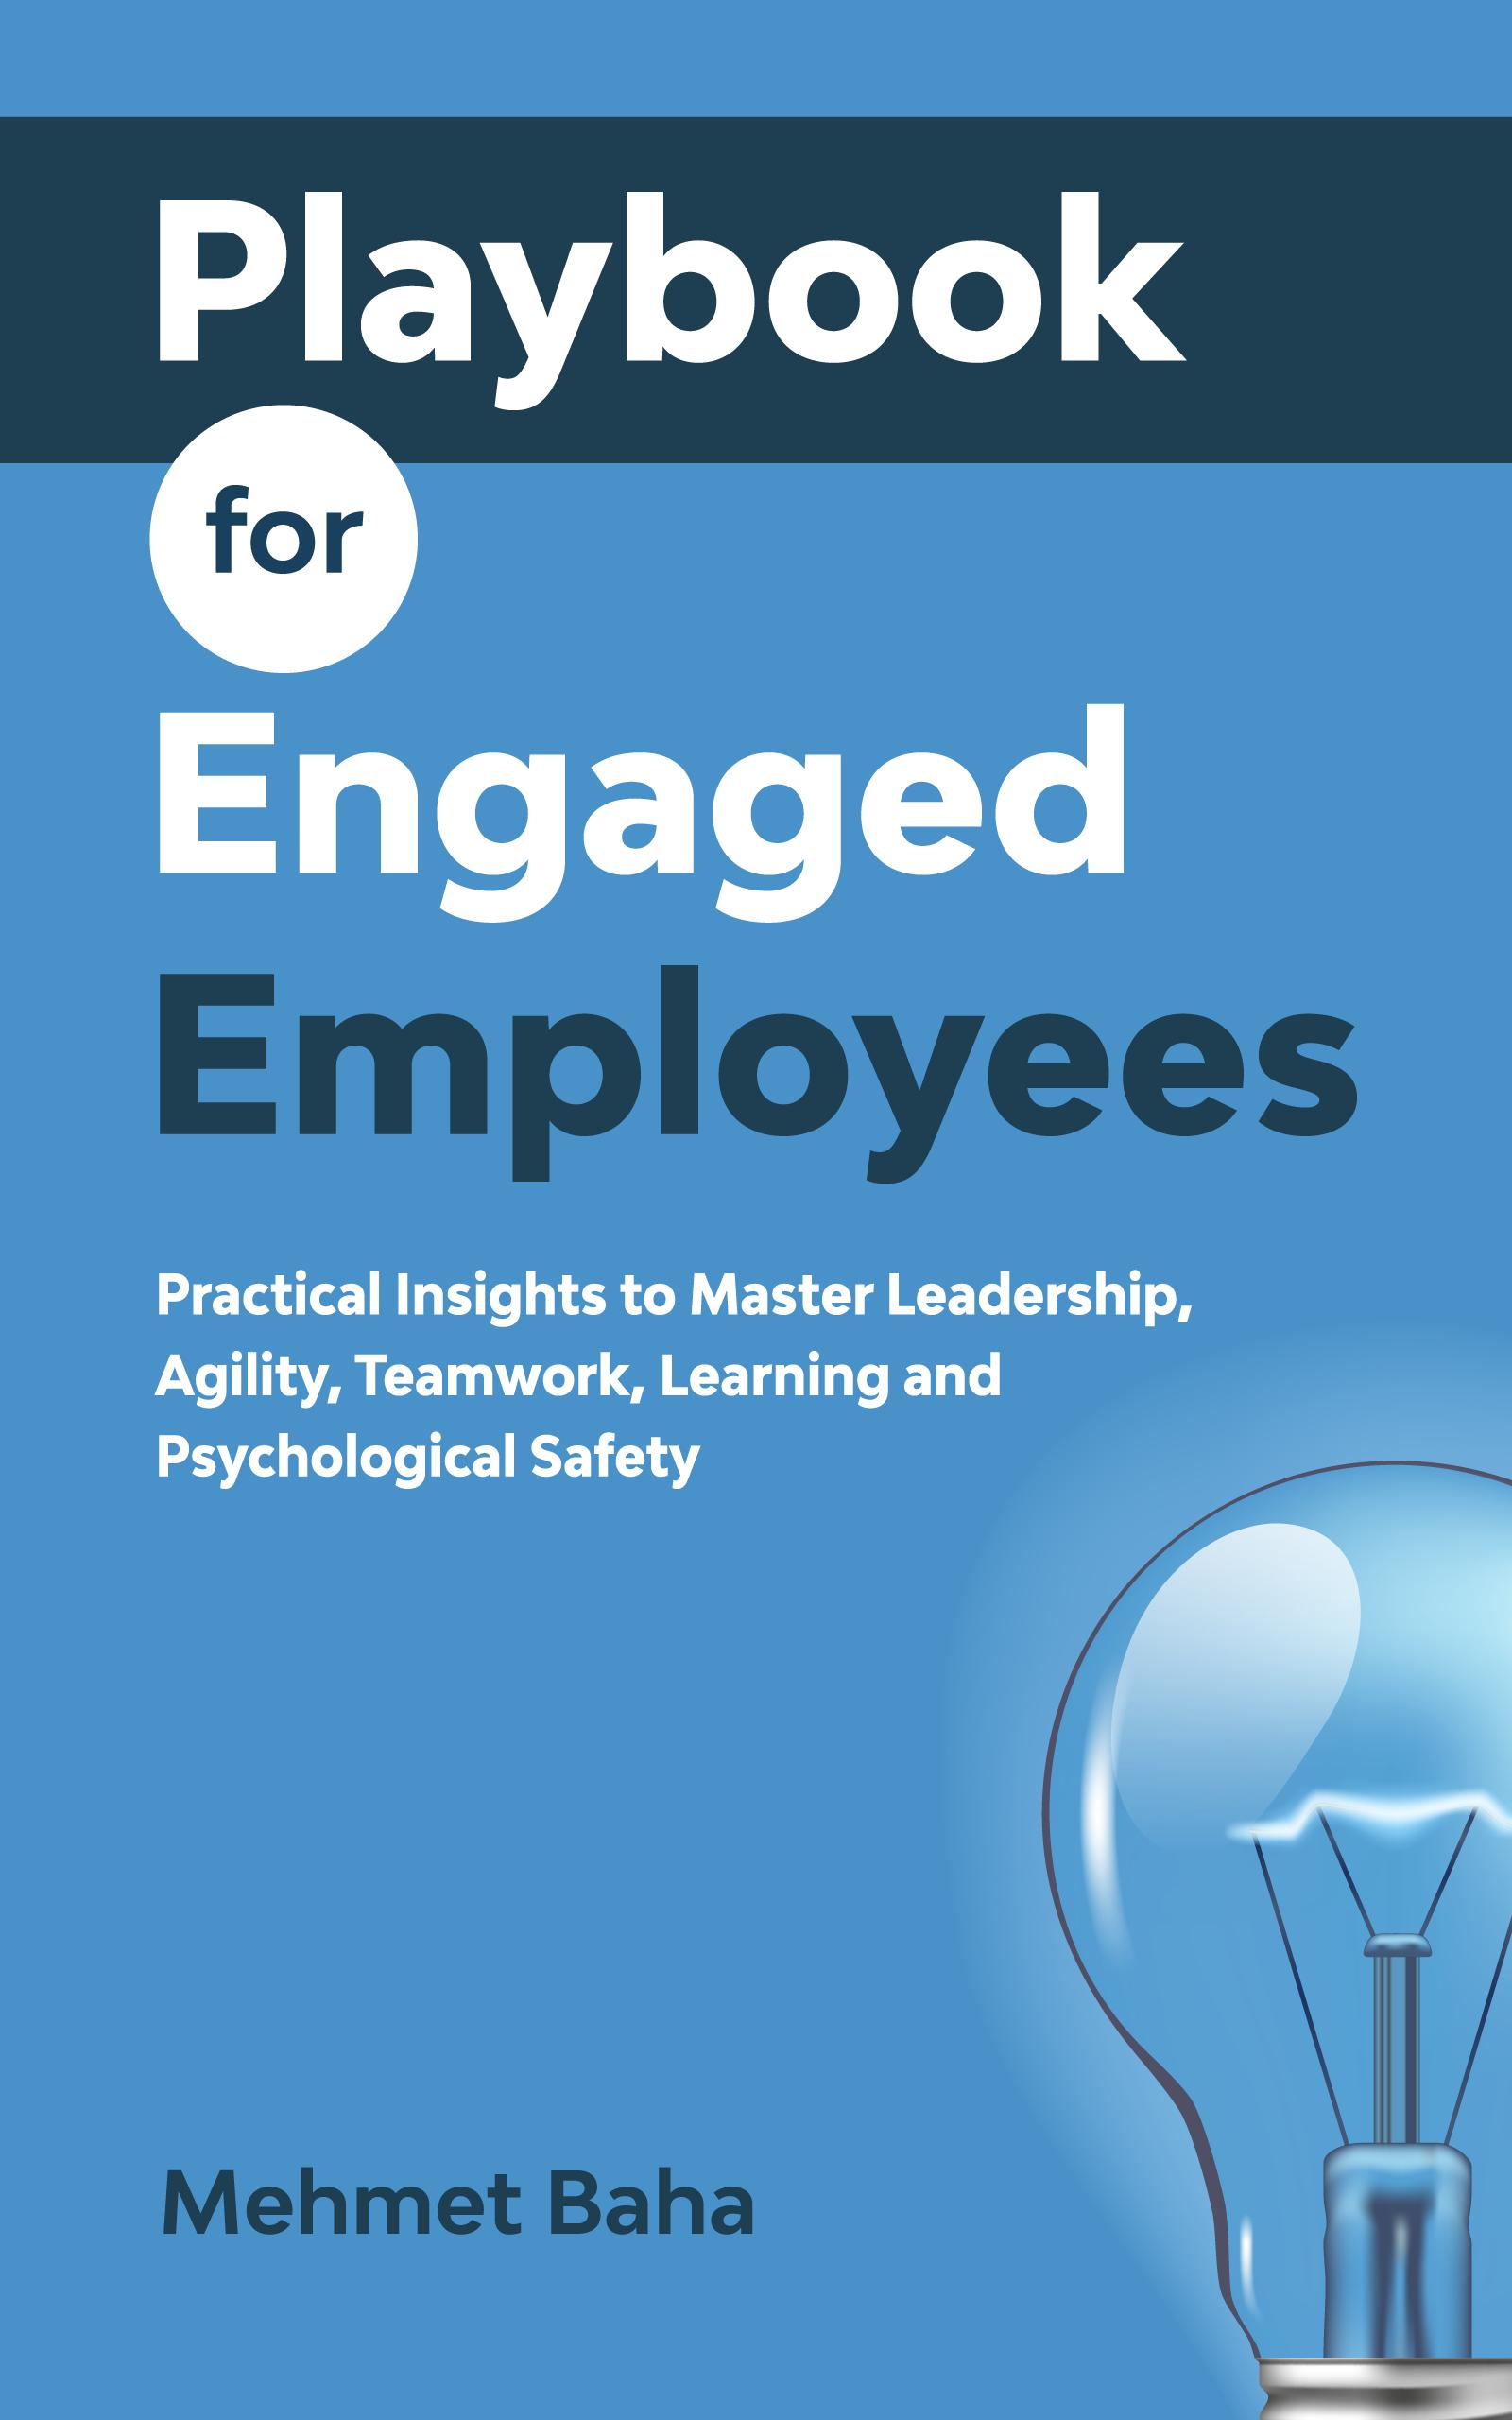 Business Book Cover (Kindle E-Book)